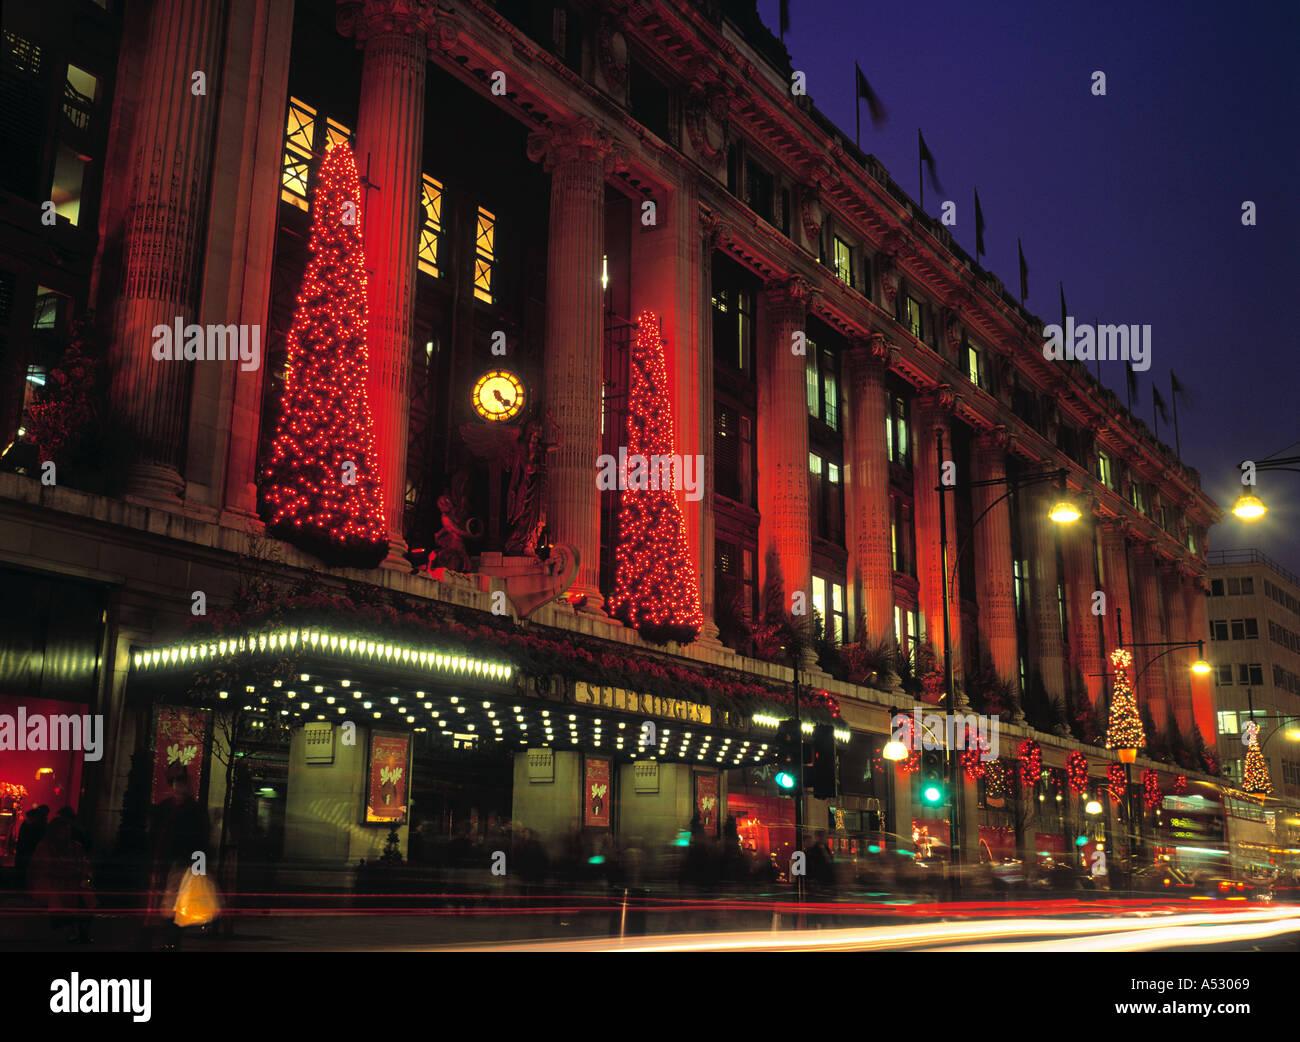 Selfridges, Oxford Street. London, England - Stock Image